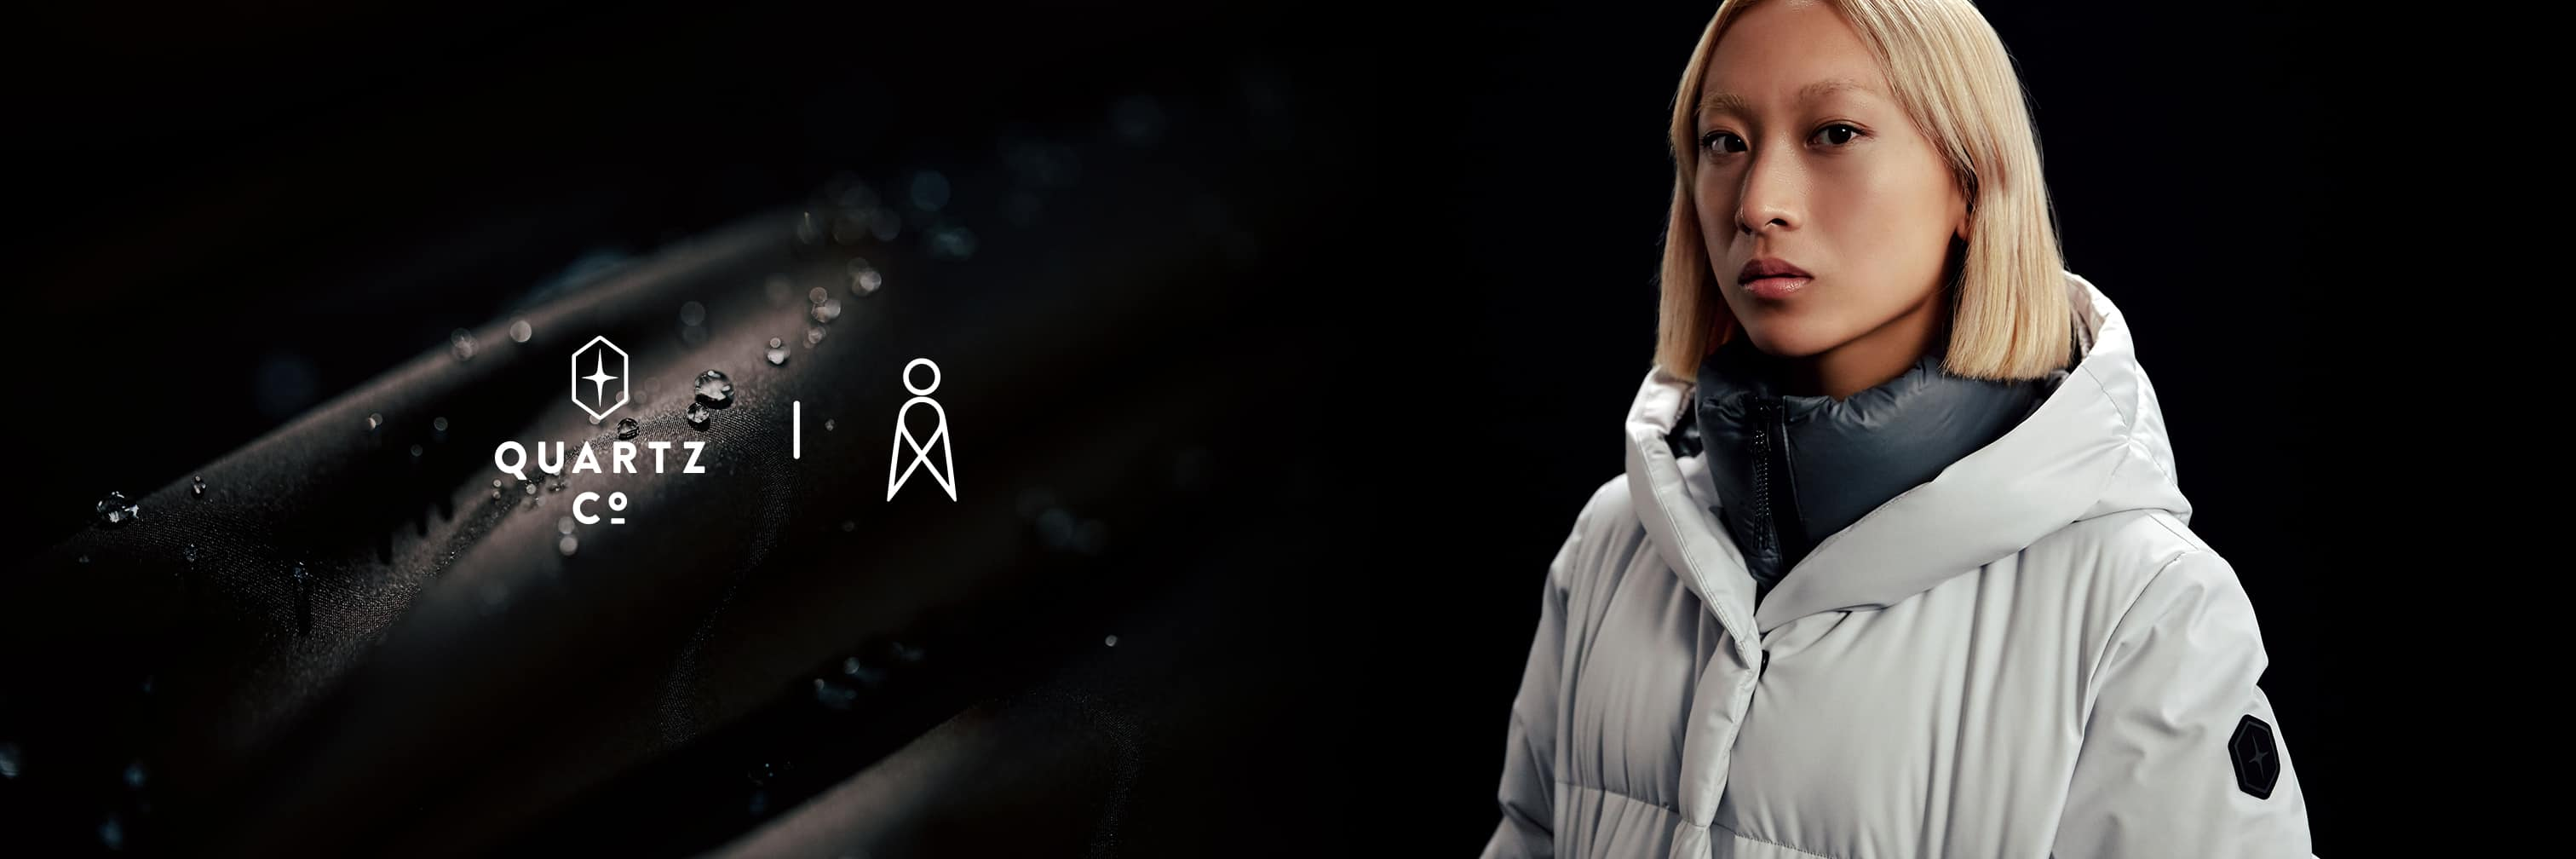 City, Meet the Outdoors: Introducing the Altitude Sports X Quartz Co. Elsa Women's Parka